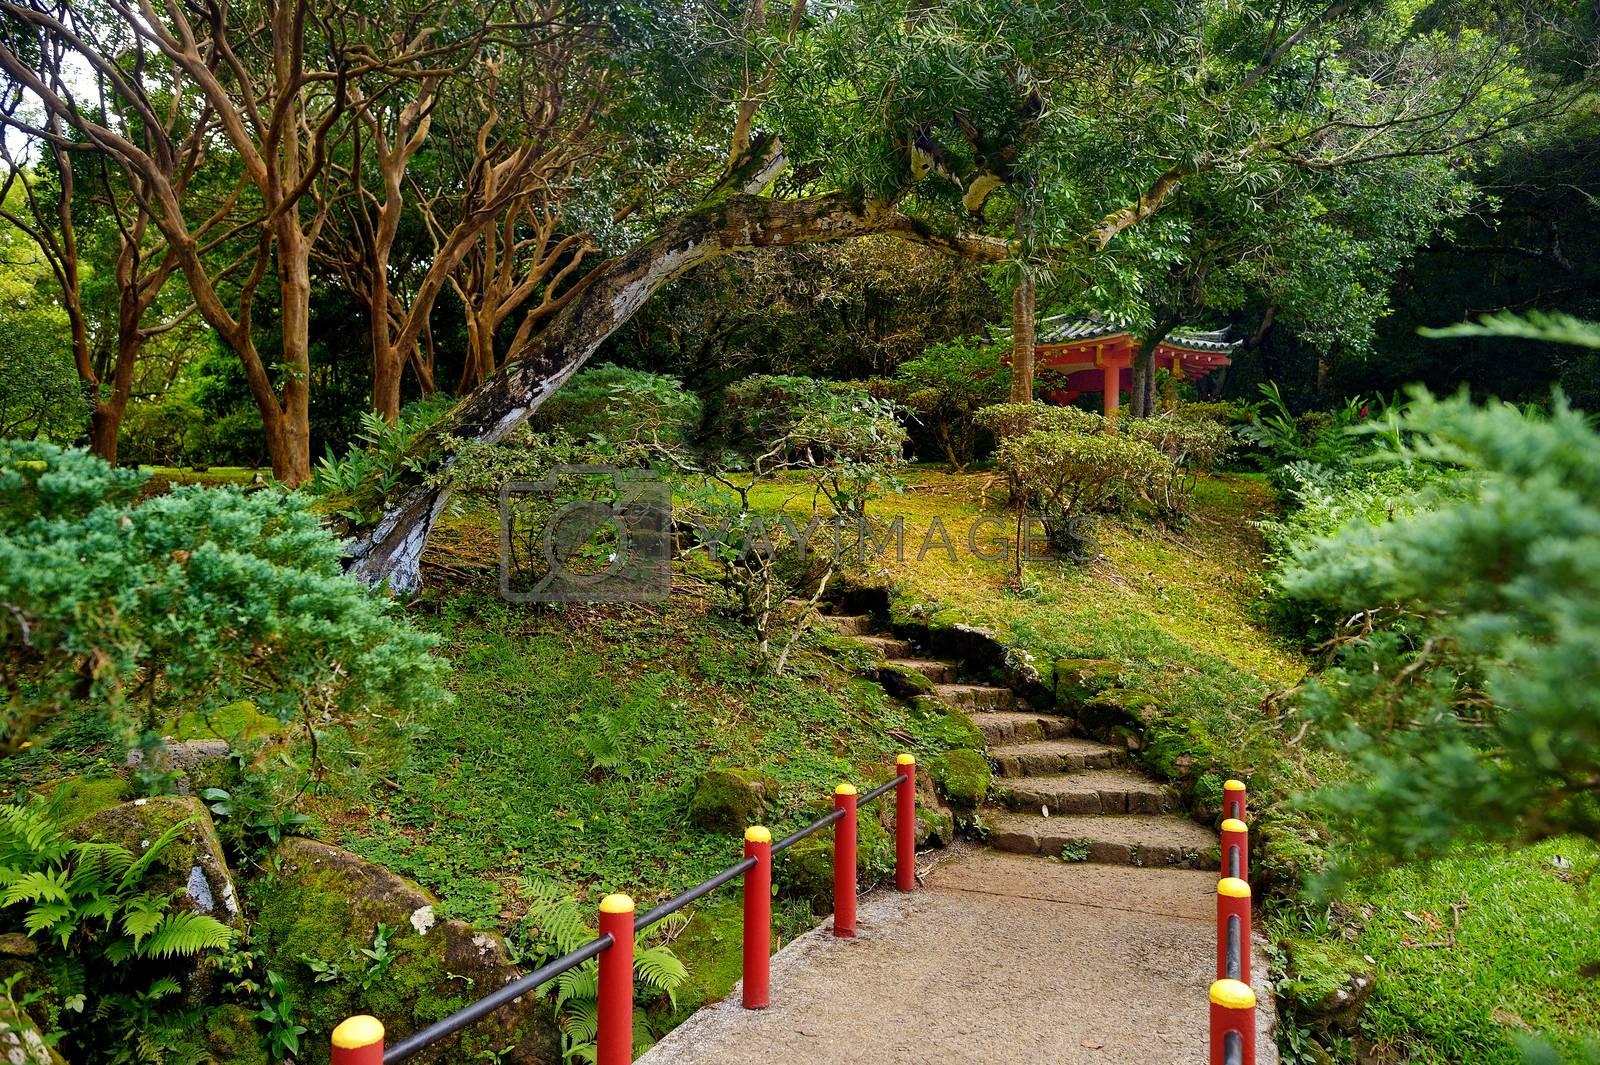 Park near the Byodo-in buddhist temple on Oahu, Hawaii